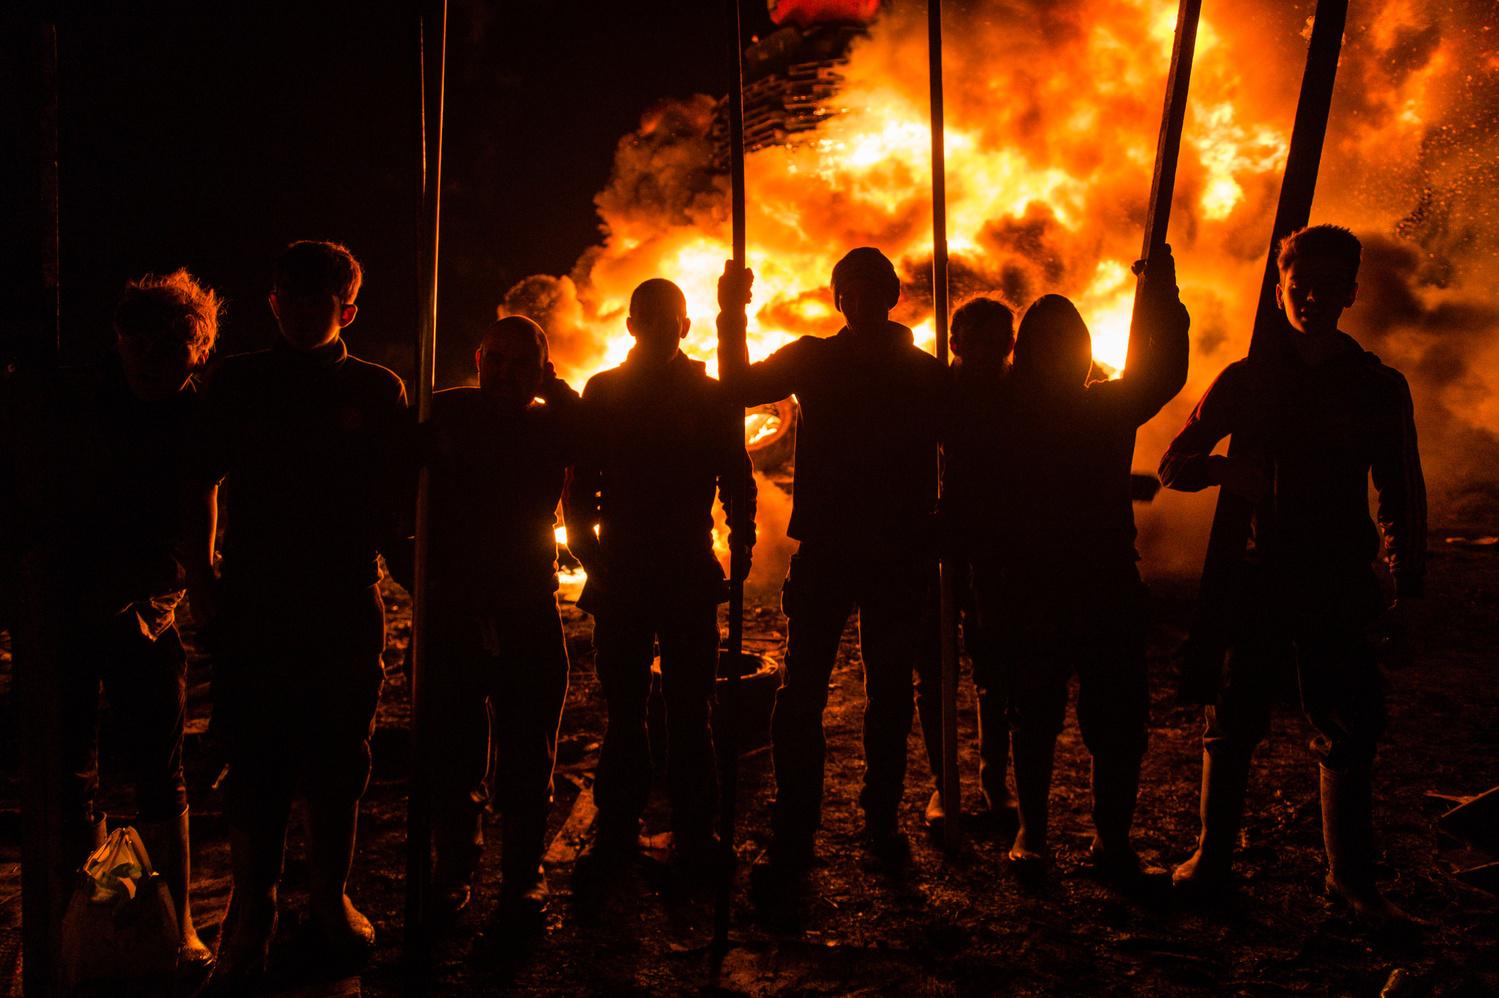 Bonfire Triumph by Ronan McGrade